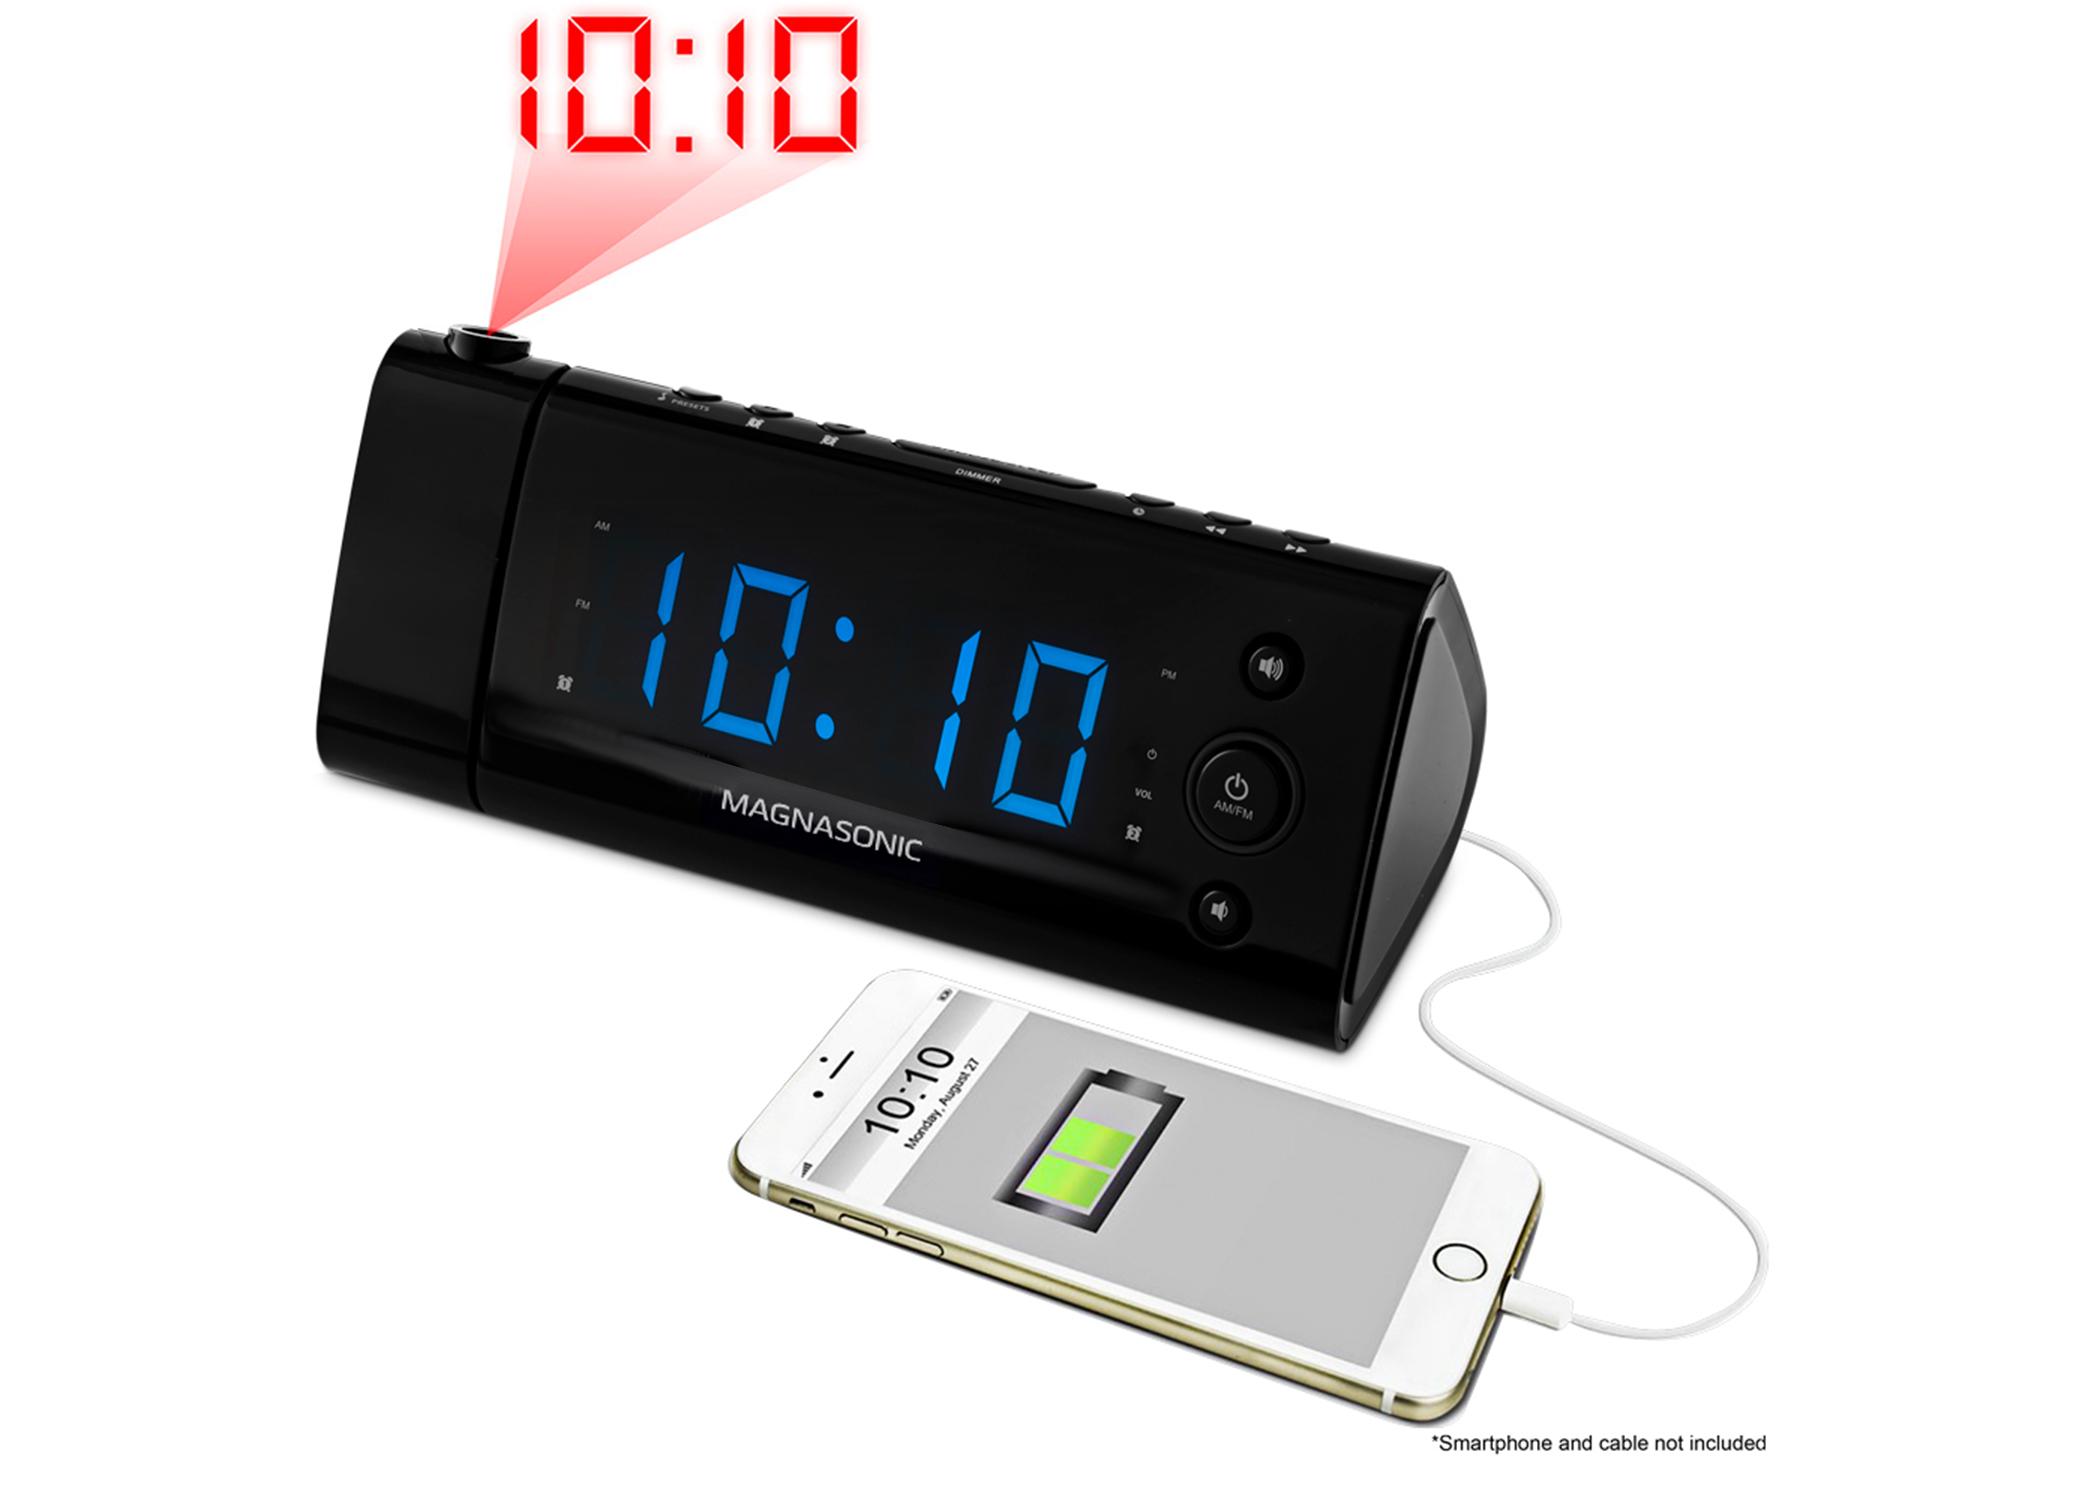 1 eaac475 main with smartphone v2